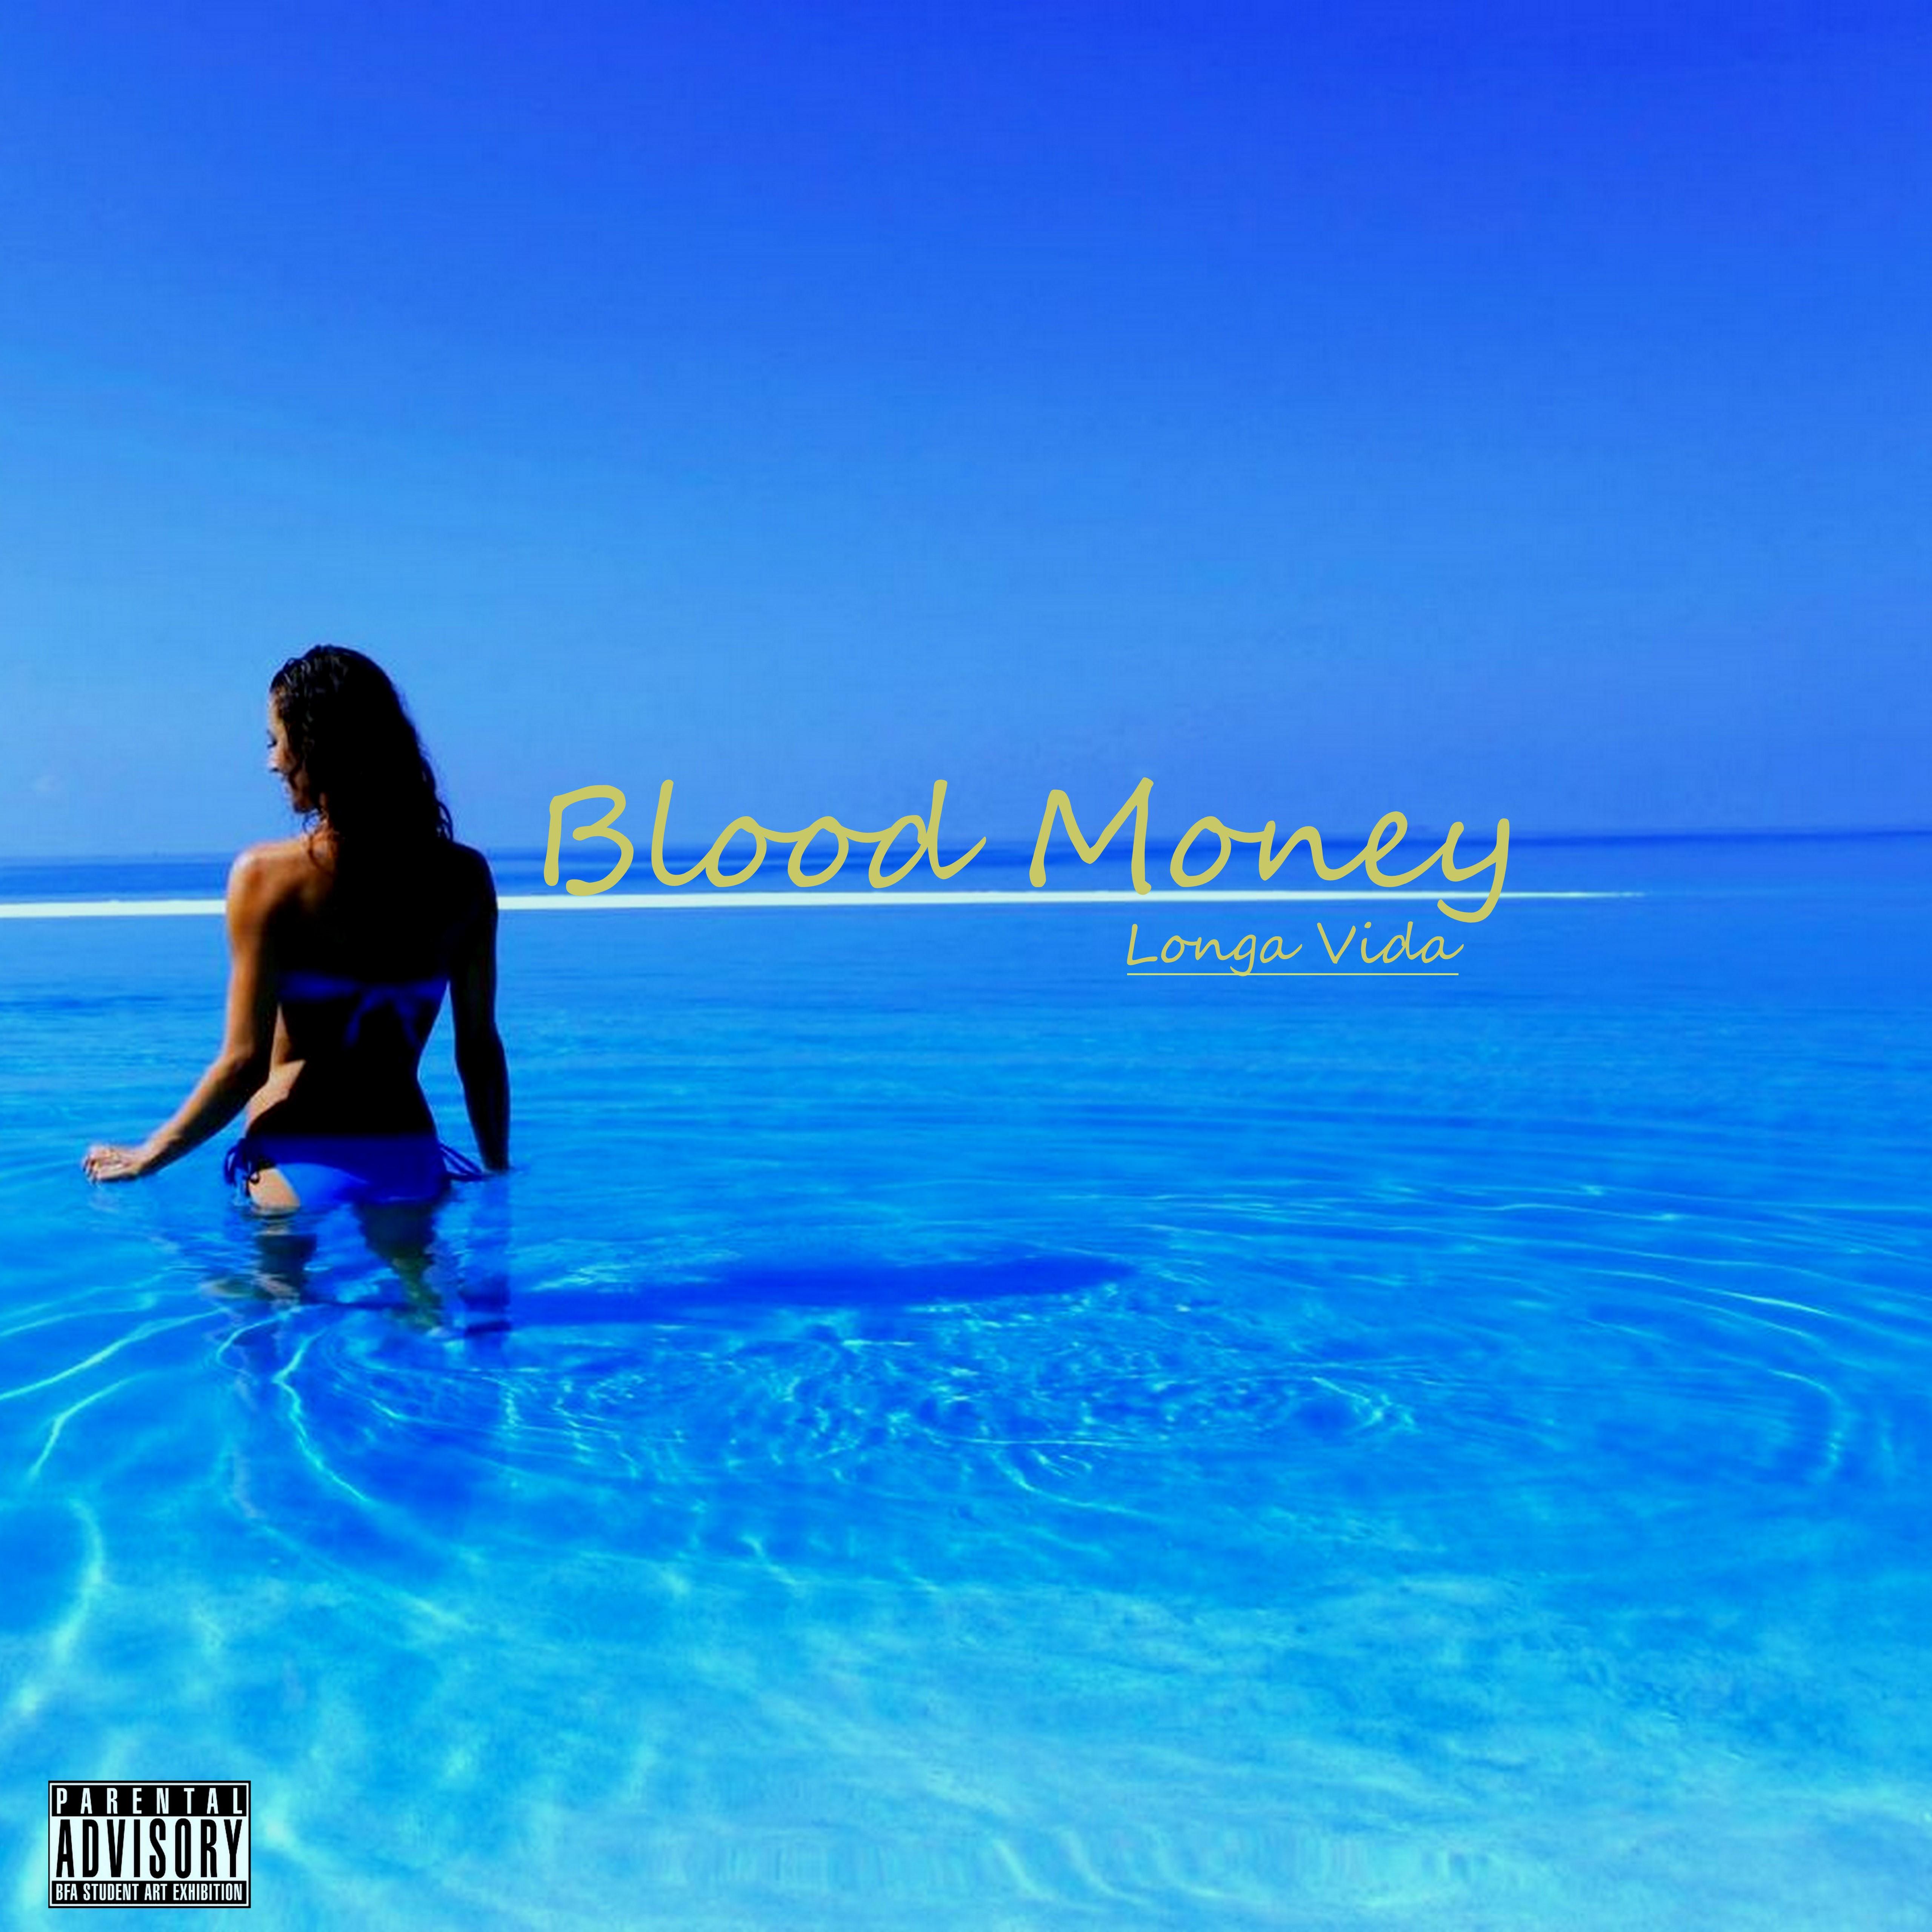 Blood-Money-Longa-Vida-Frente2